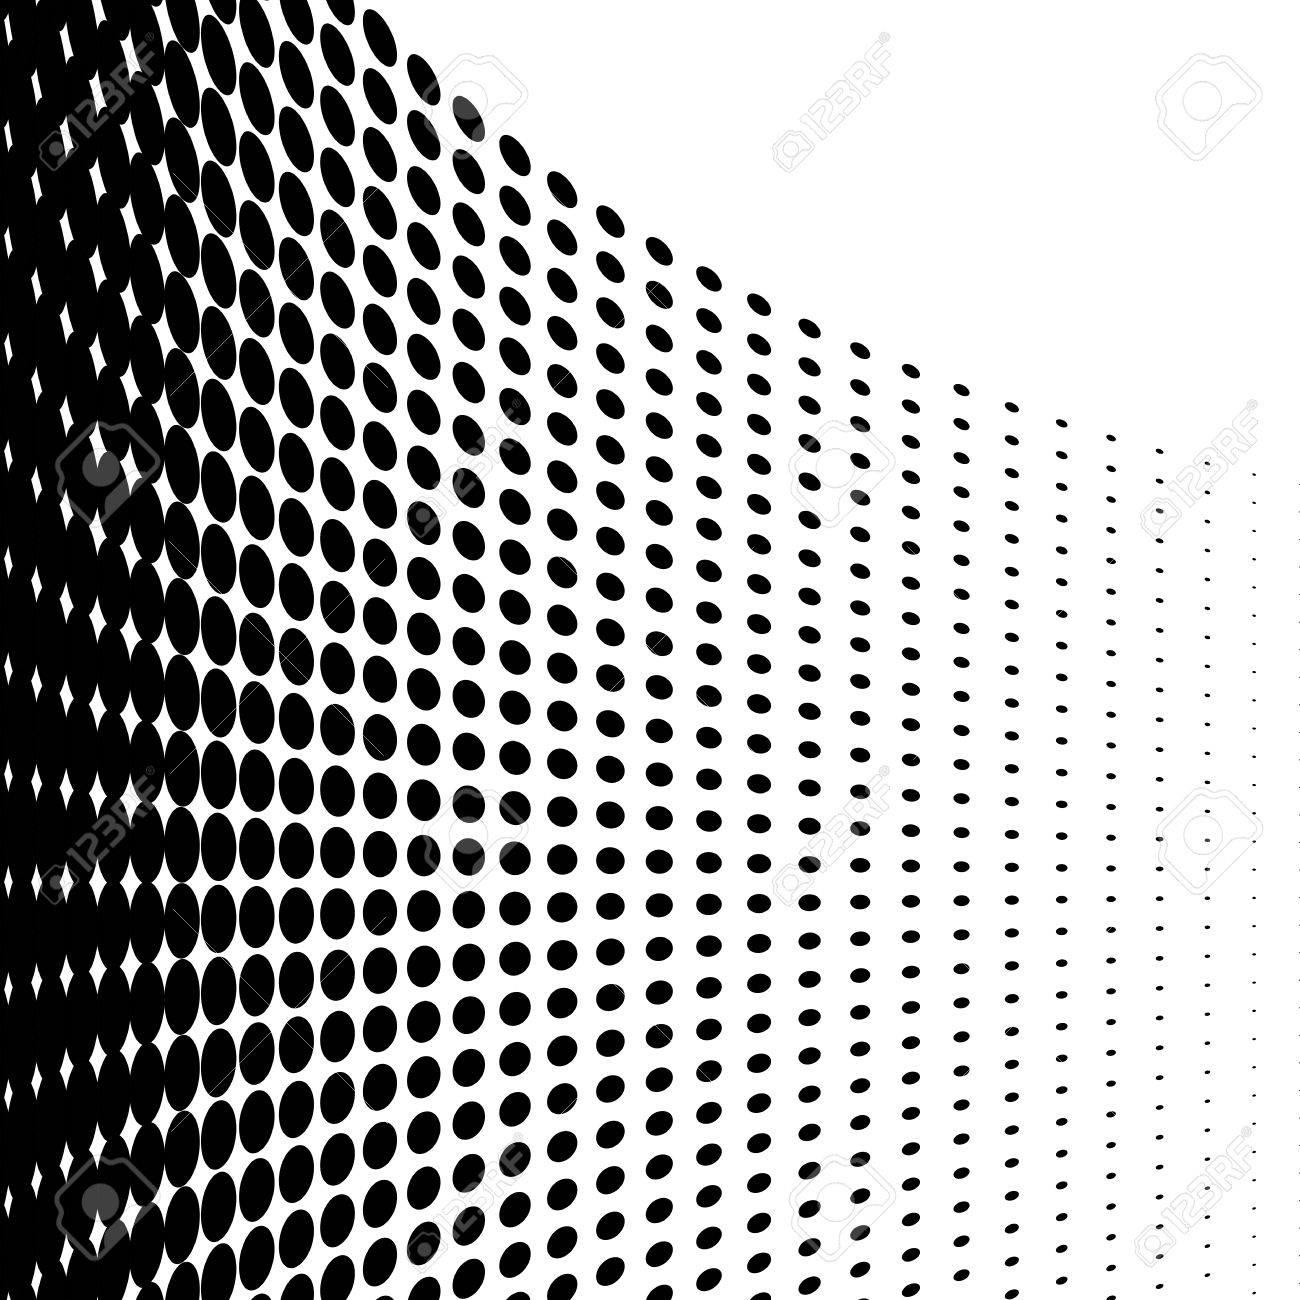 halftone illustrator halftone dots halftone effect halftone rh 123rf com halftone vector online halftone vector free